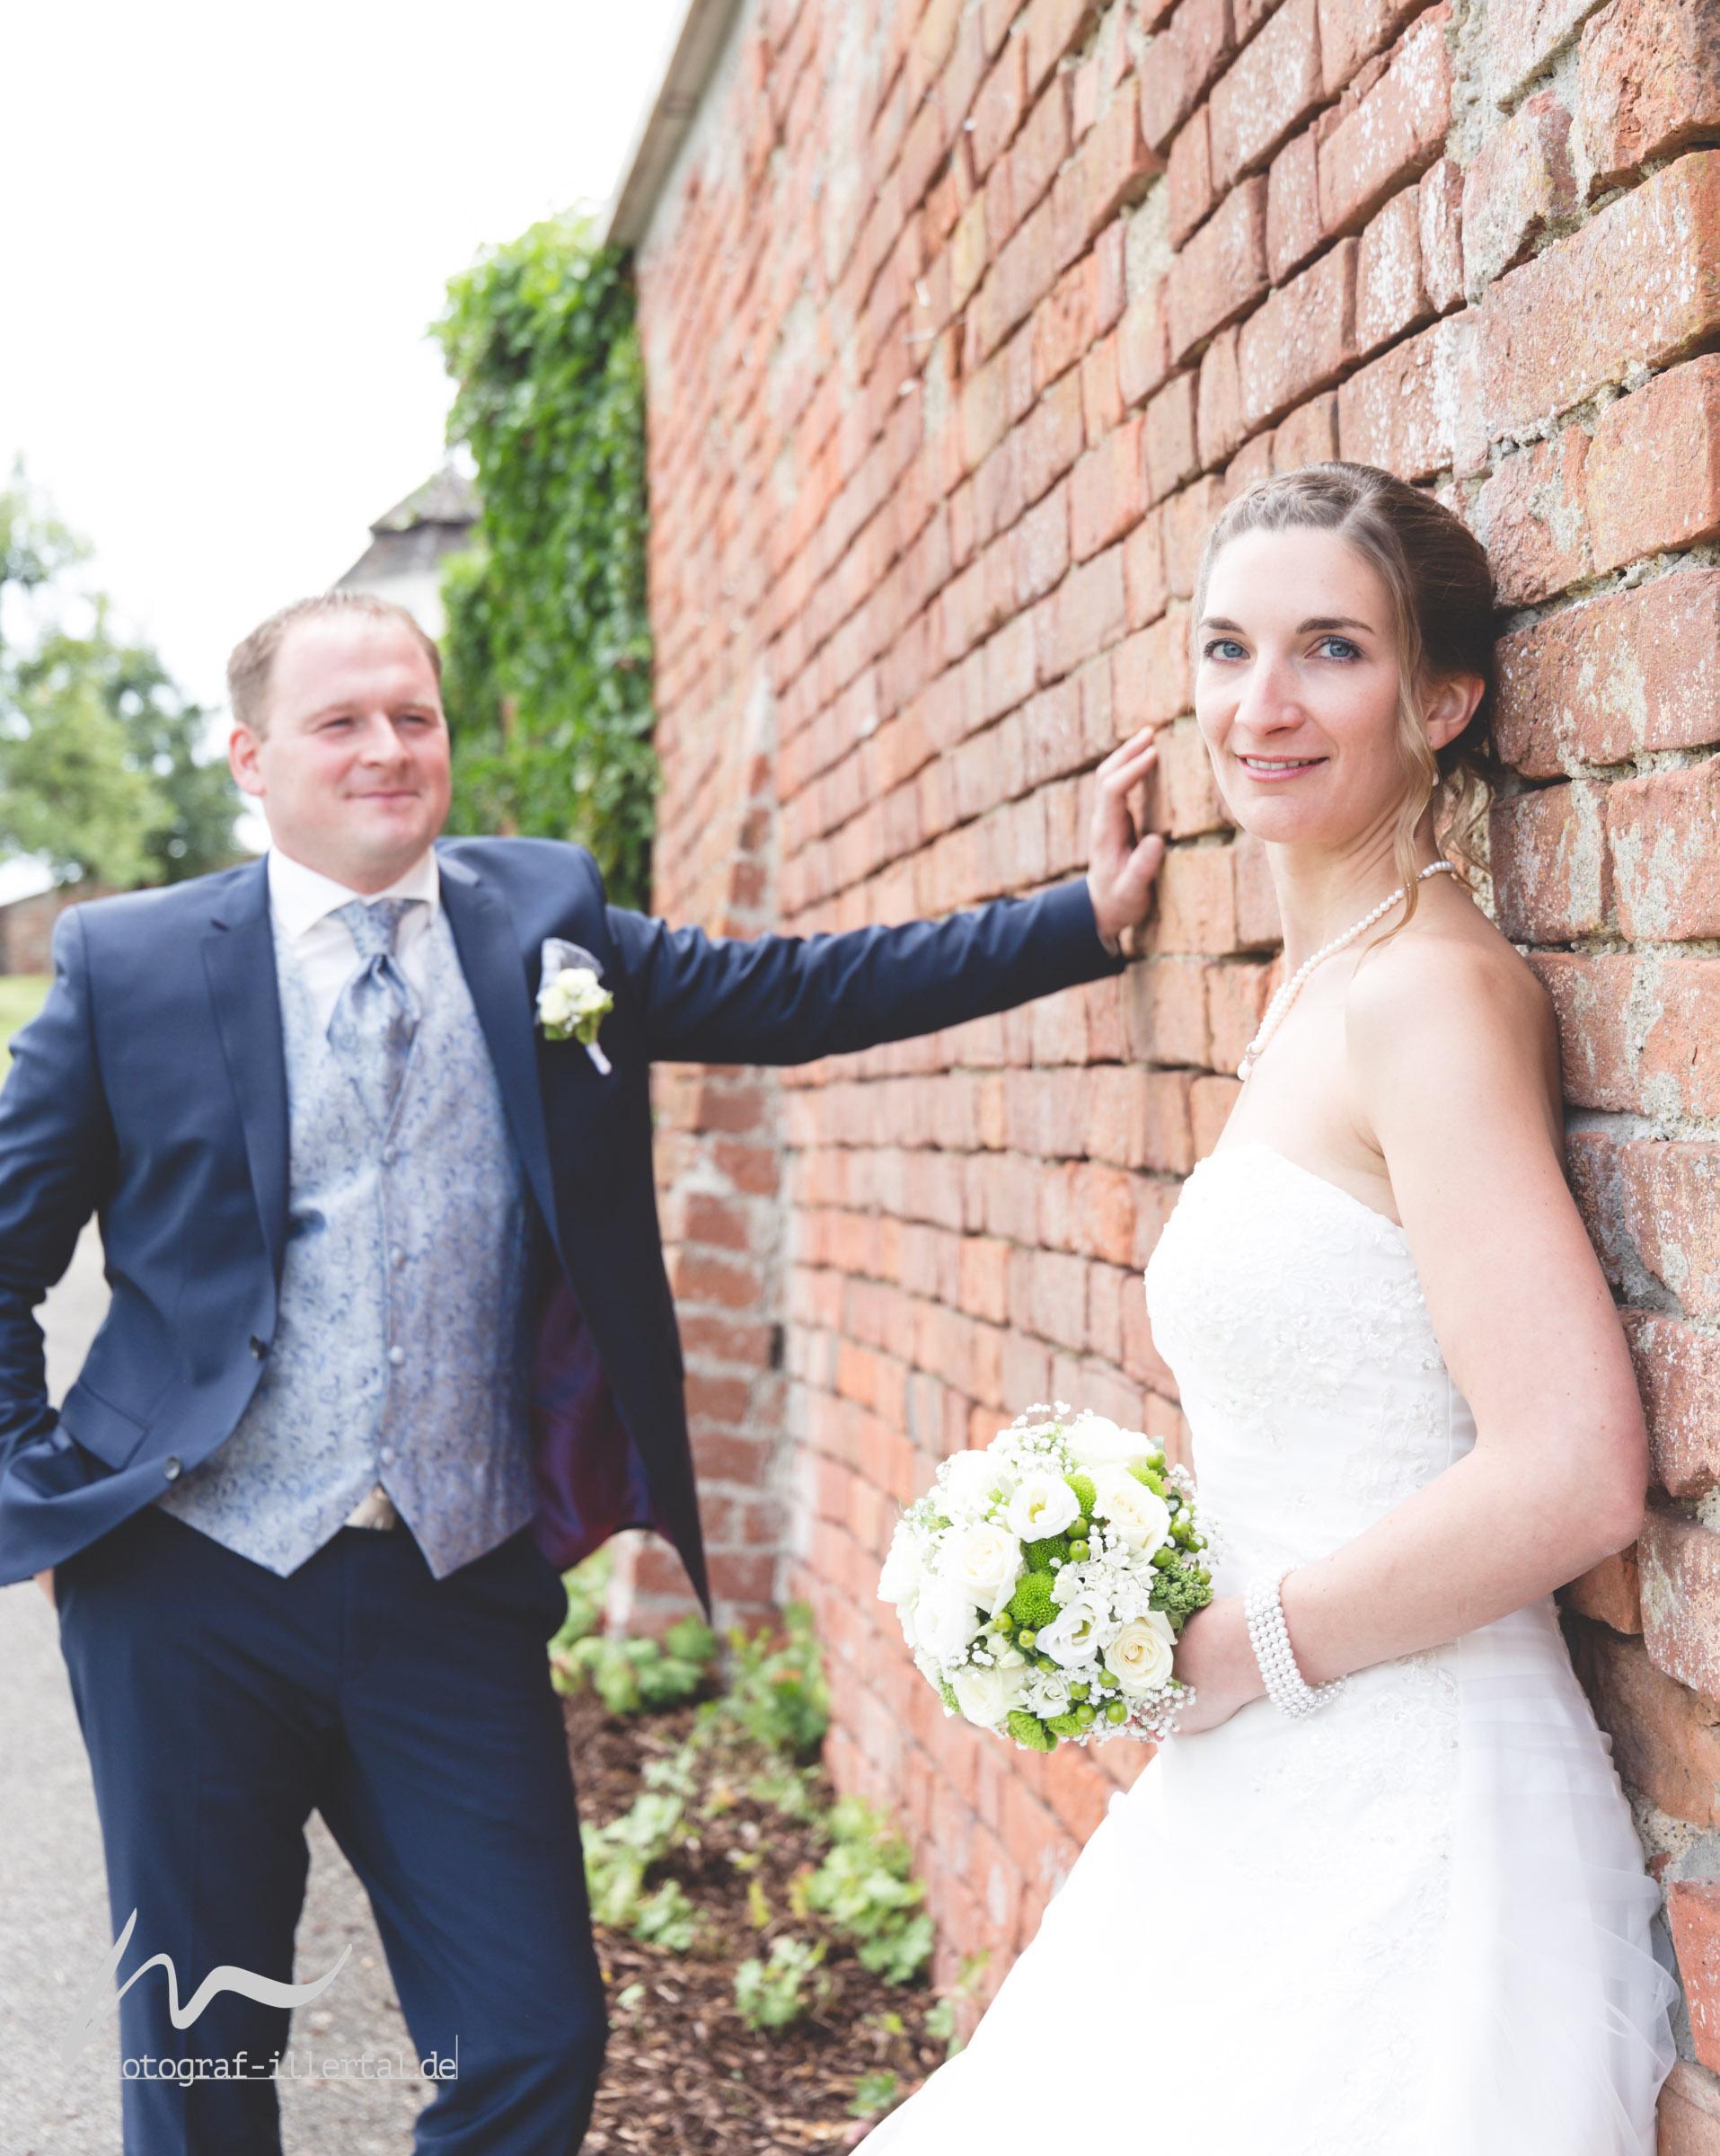 Fotograf Illertal-Christian Miller-Hochzeitsfotografie-_MG_3266